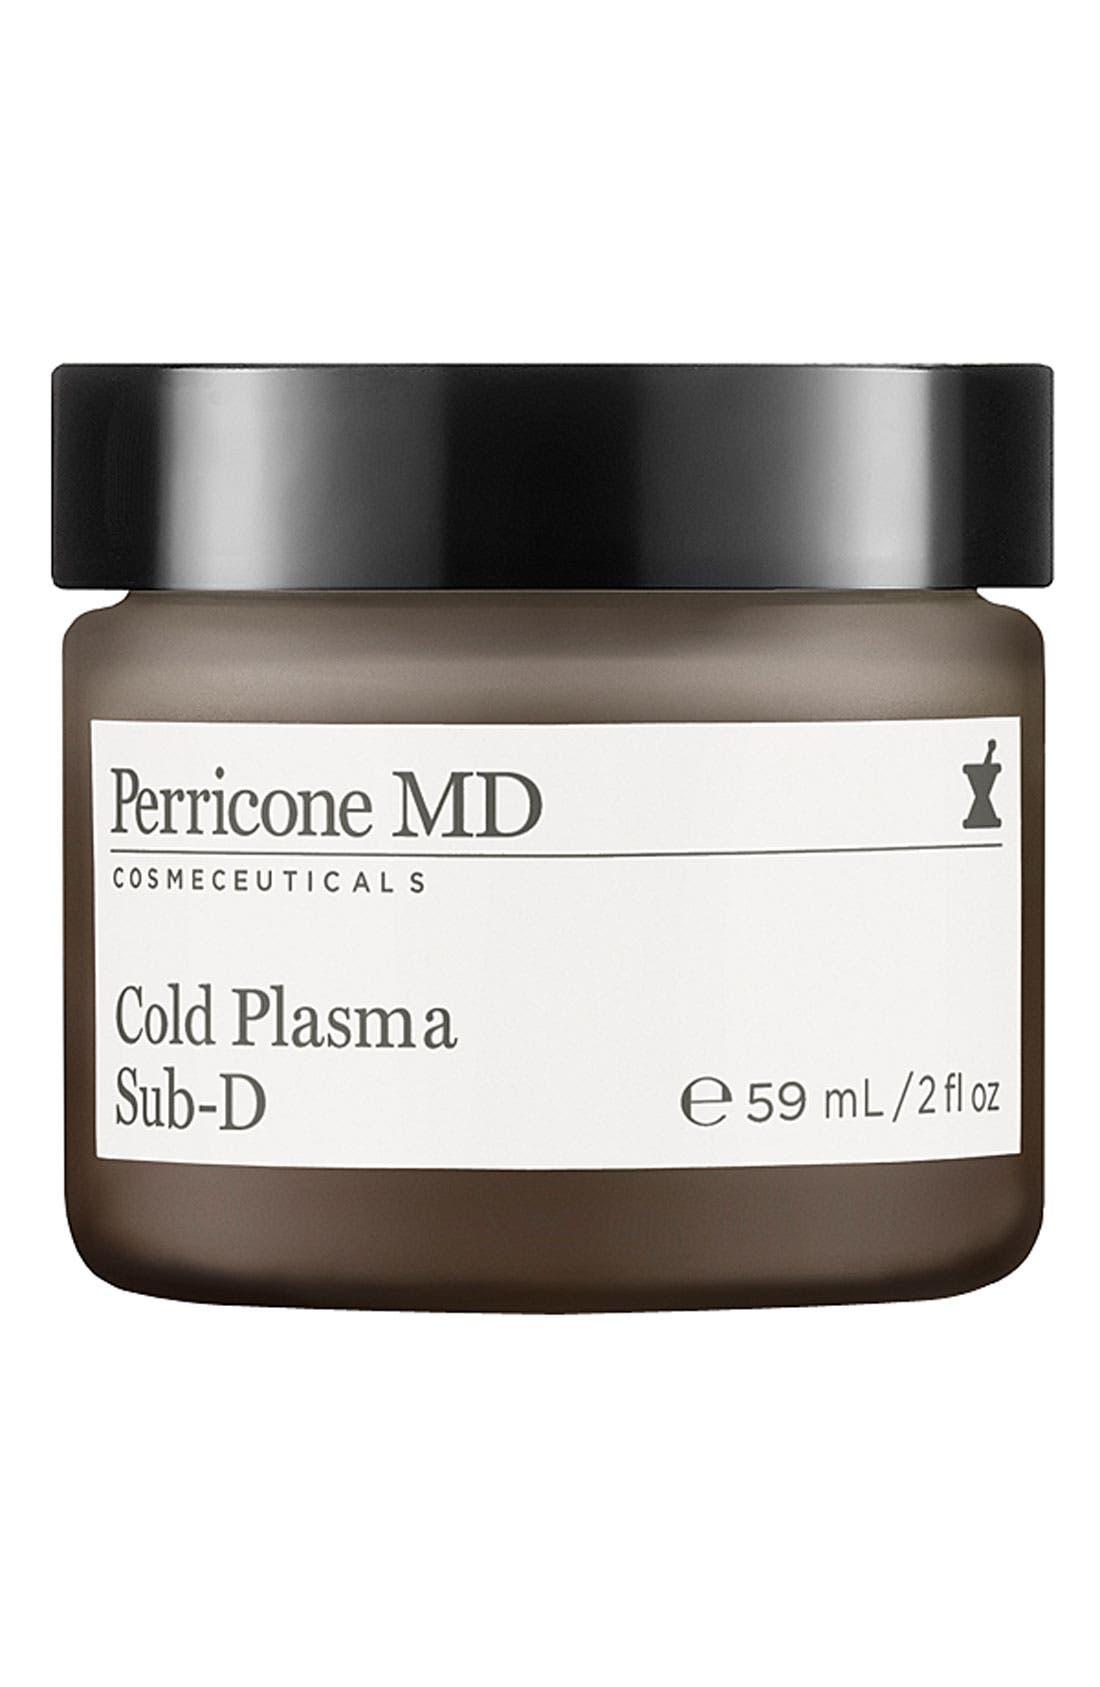 Perricone MD Cold Plasma Sub-D